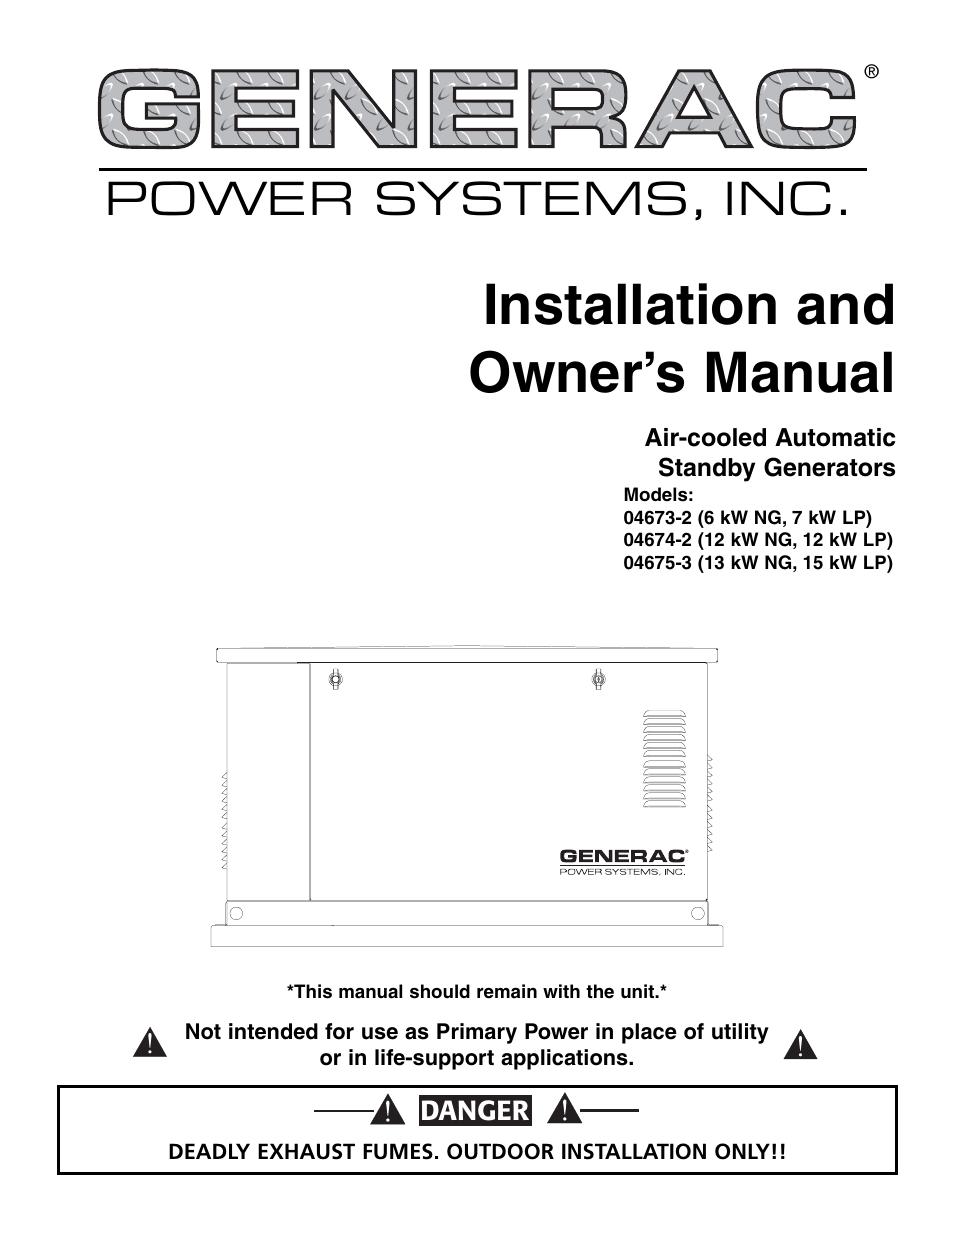 generac 04673-2 user manual | 56 pages | also for: 04674-2 ... generac wiring diagram generac wiring manuals